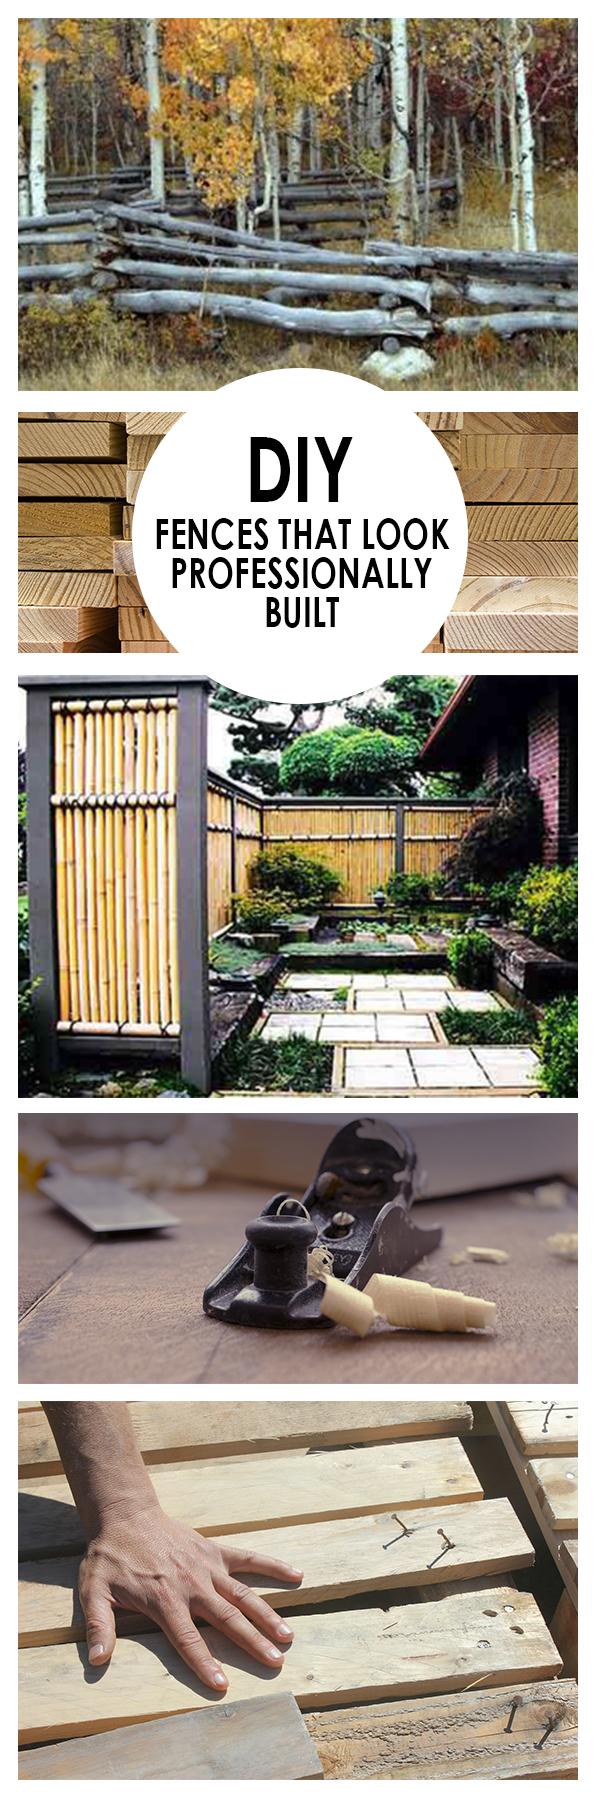 DIY Fences That Look Professionally Built (1)